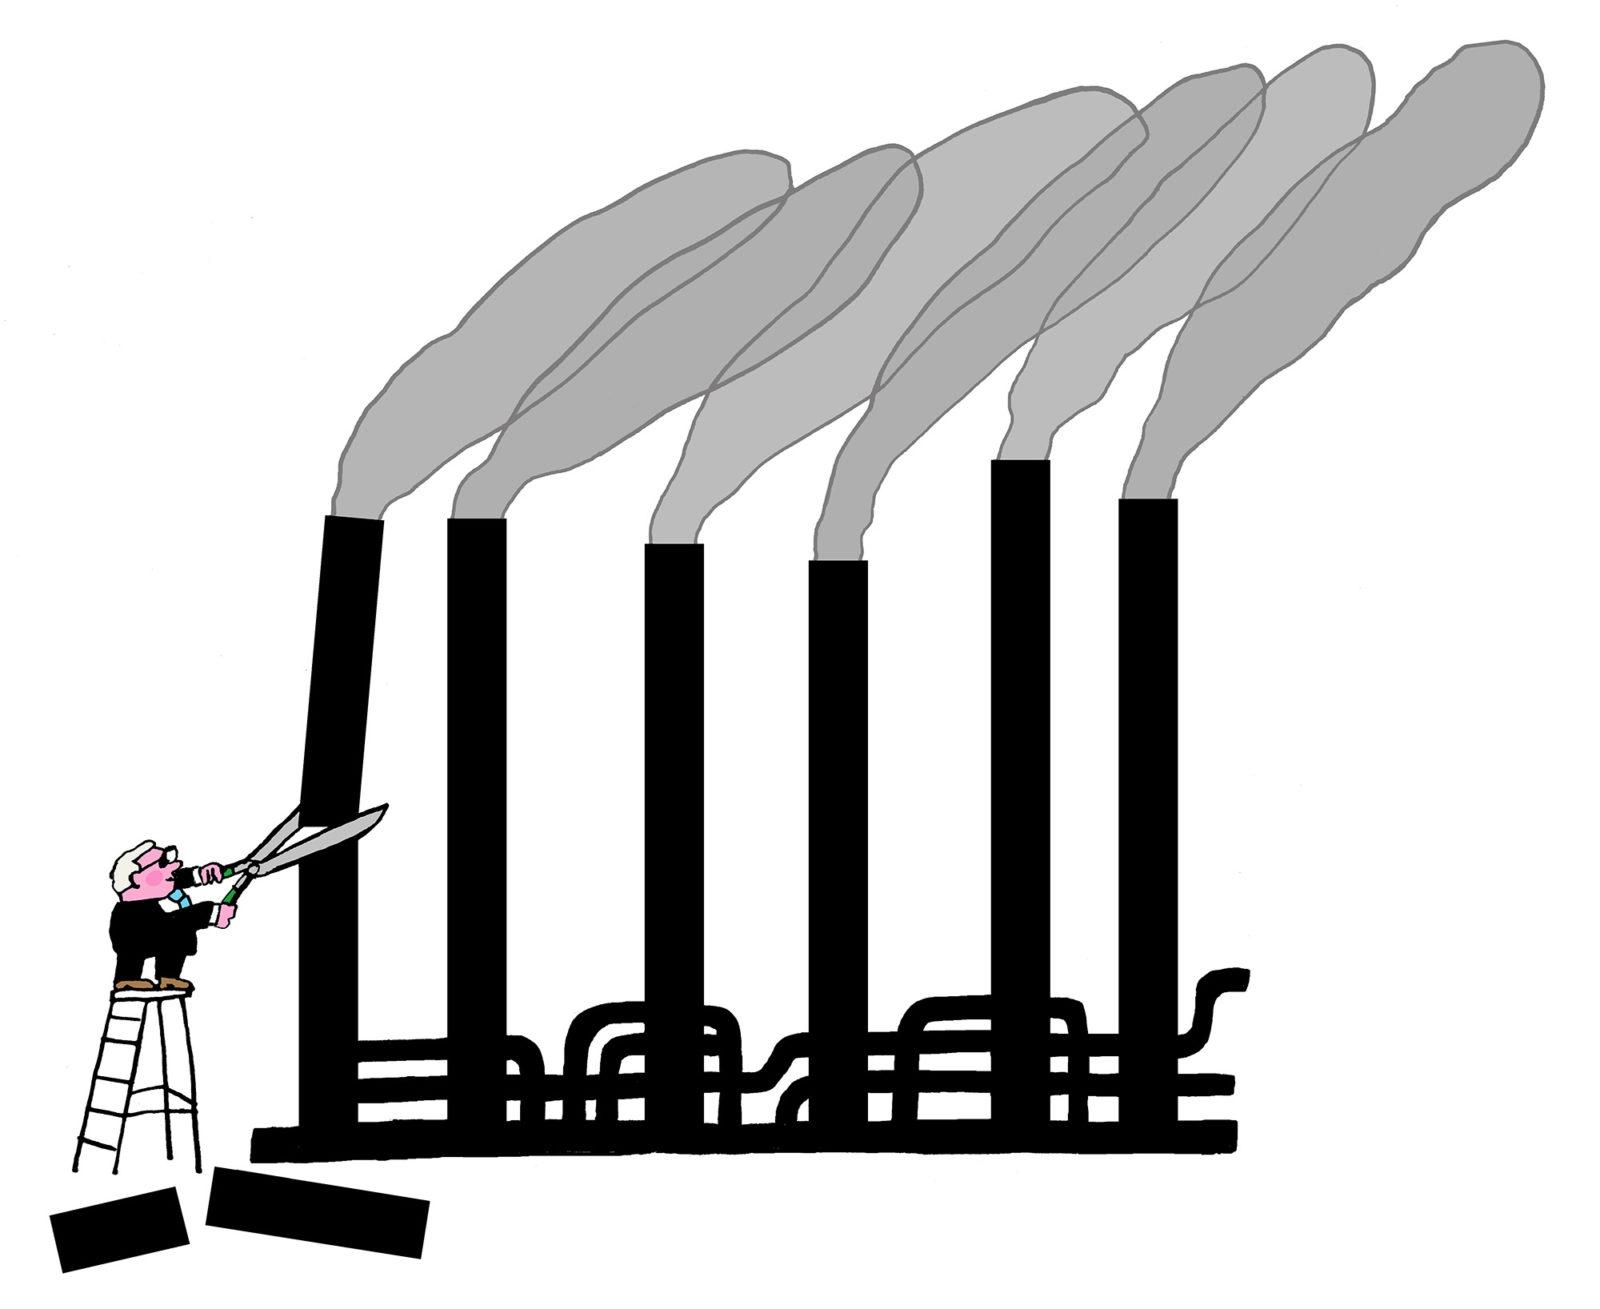 kwestie-duurzamer-monetair-beleid-snoeien-in-fossiele-industrie-bas-van-der-schot